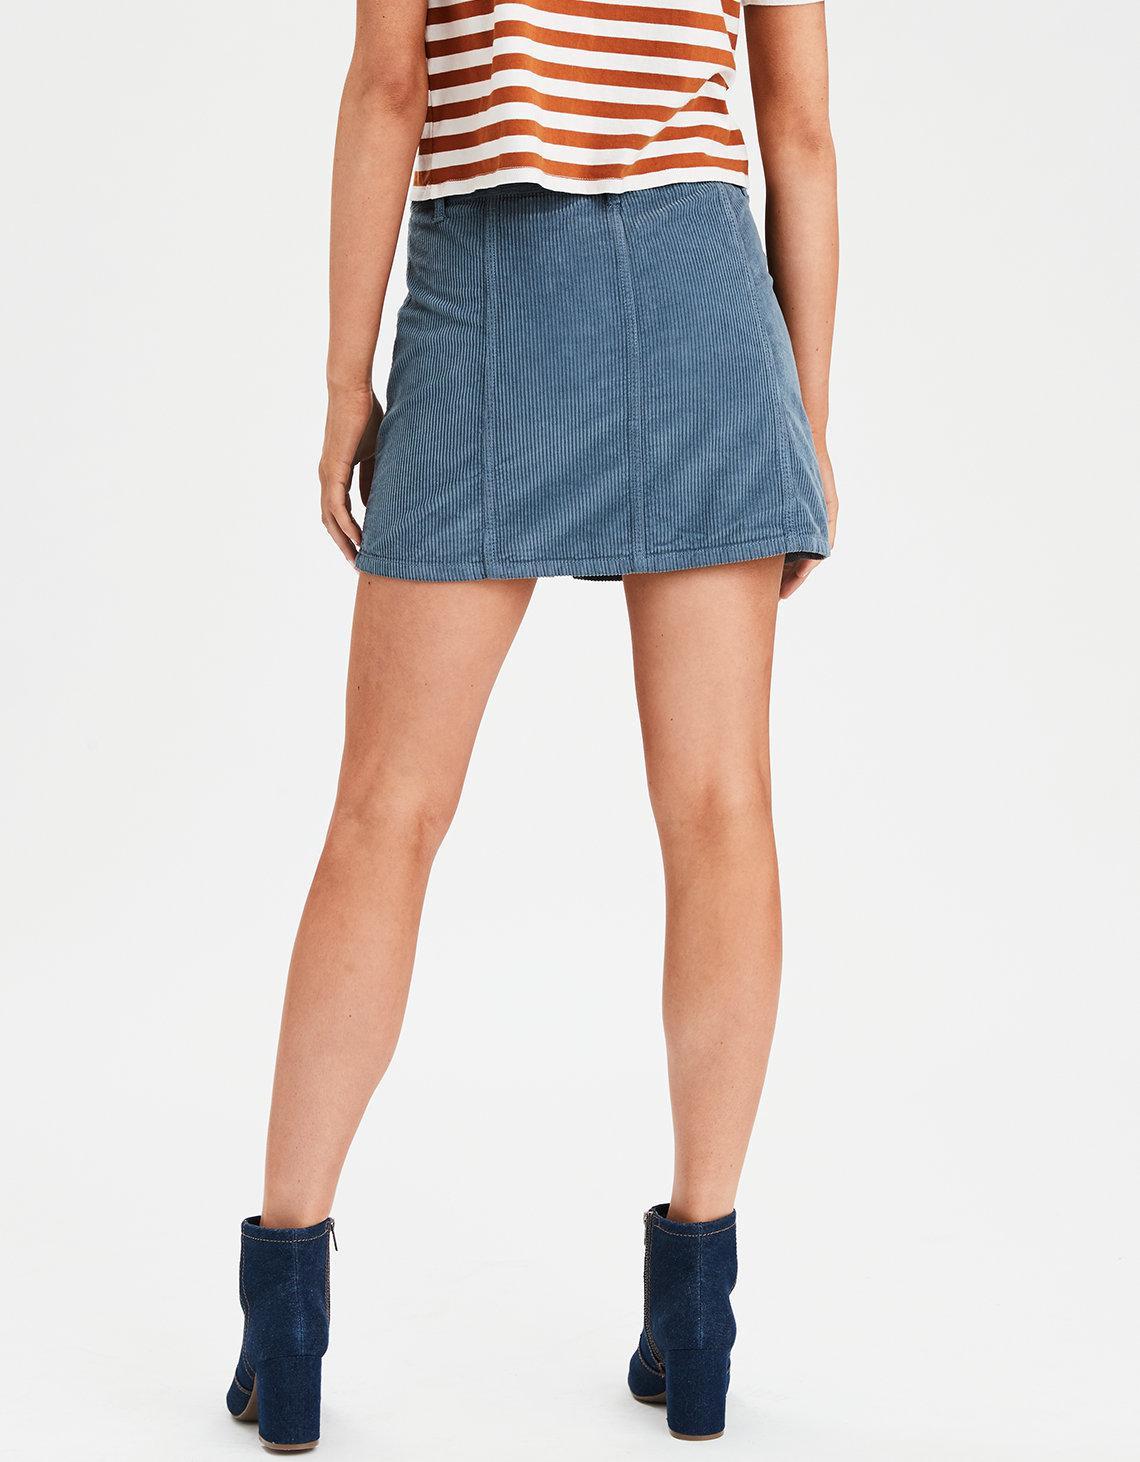 ebdde31bb American Eagle Ae High-waisted Festival Corduroy Skirt in Blue - Lyst